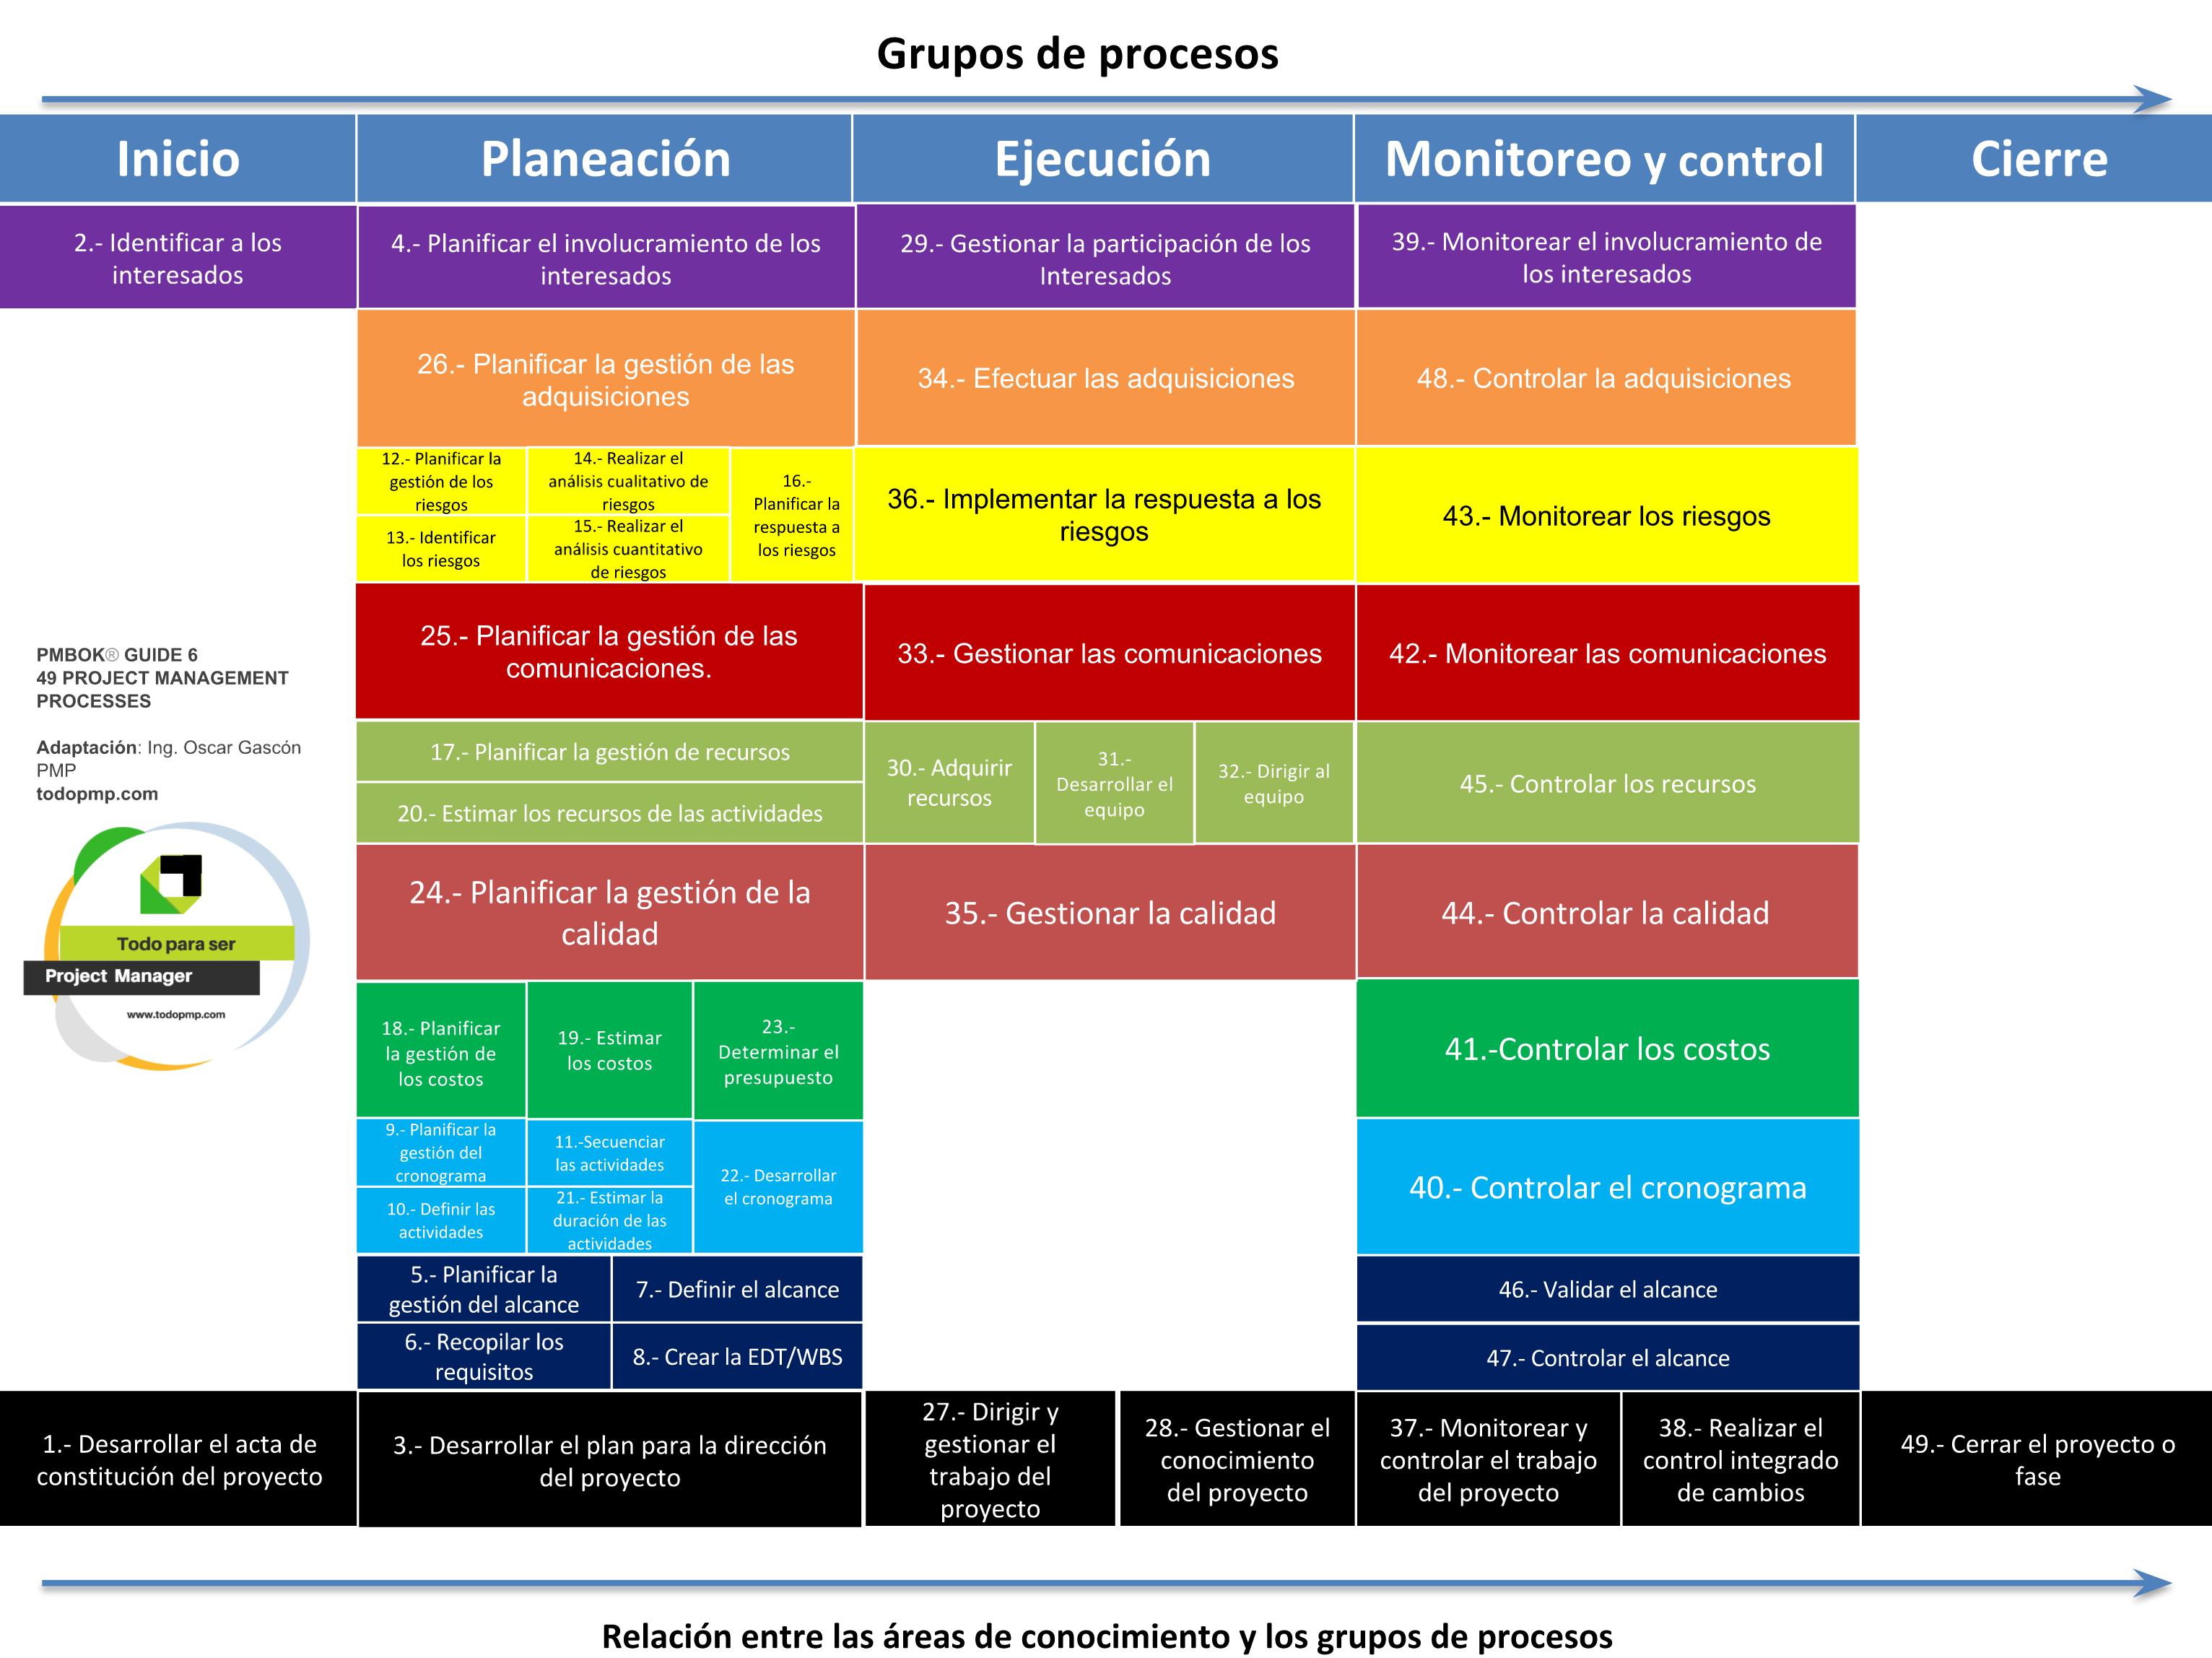 Pmbok resume